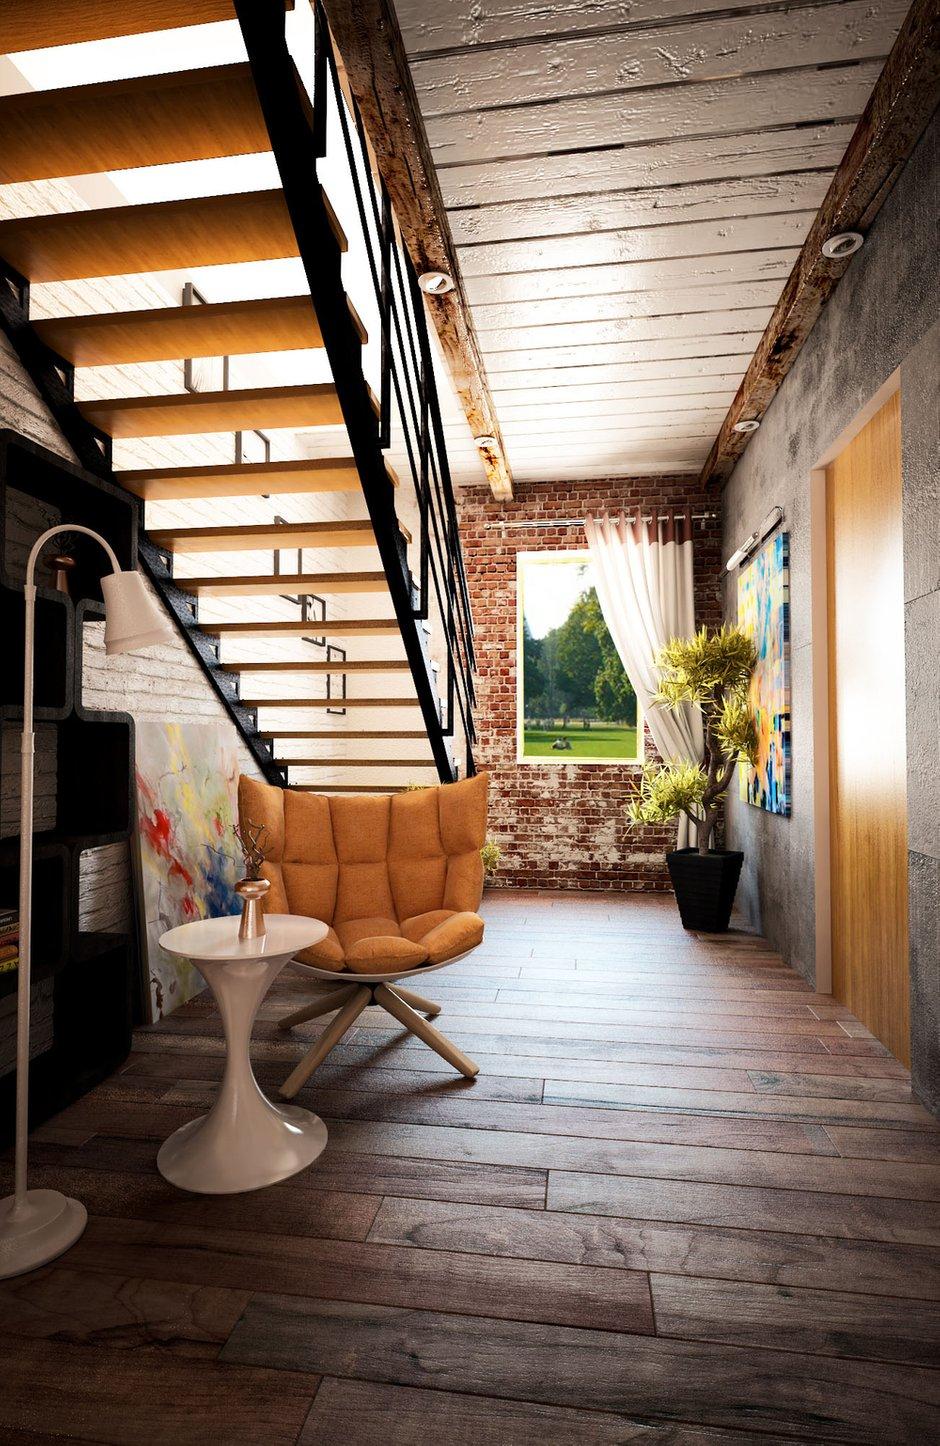 Фотография: Прихожая в стиле Лофт, Квартира, Дом, Дома и квартиры, Проект недели – фото на InMyRoom.ru